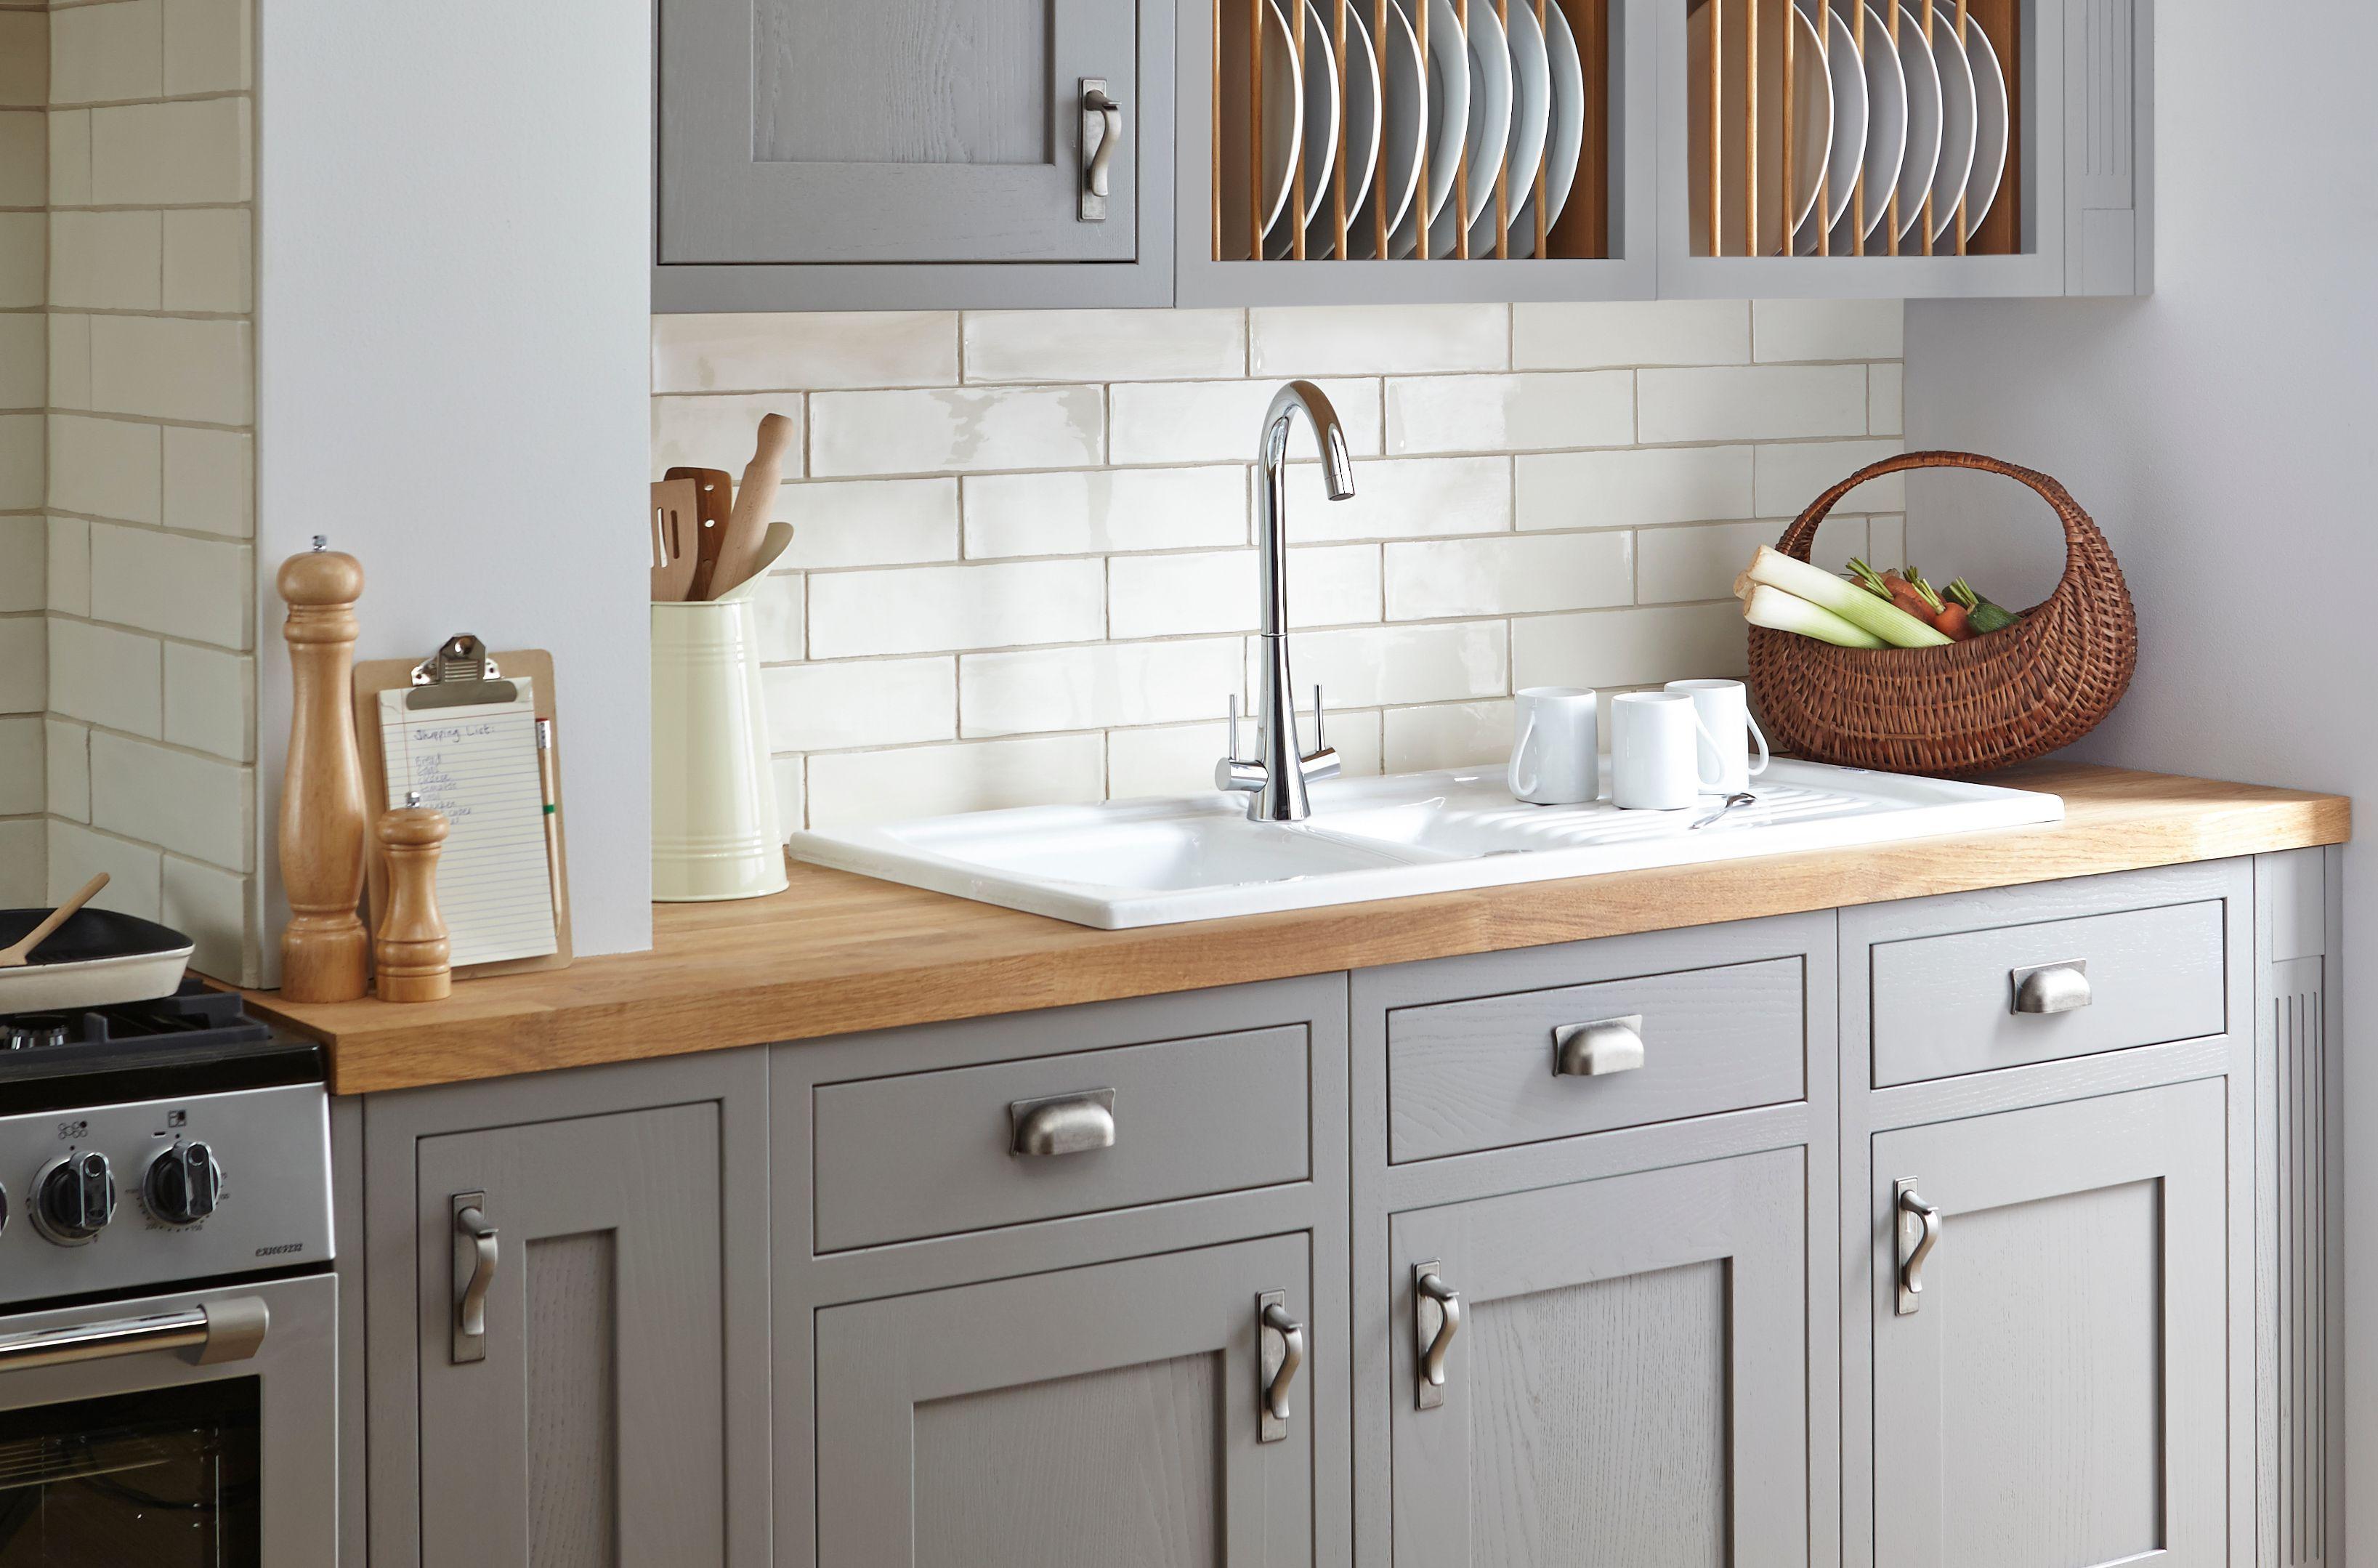 Cooke & Lewis Carisbrooke Taupe Framed  Diy At B&q  Kitchen Extraordinary Bandq Kitchen Design Inspiration